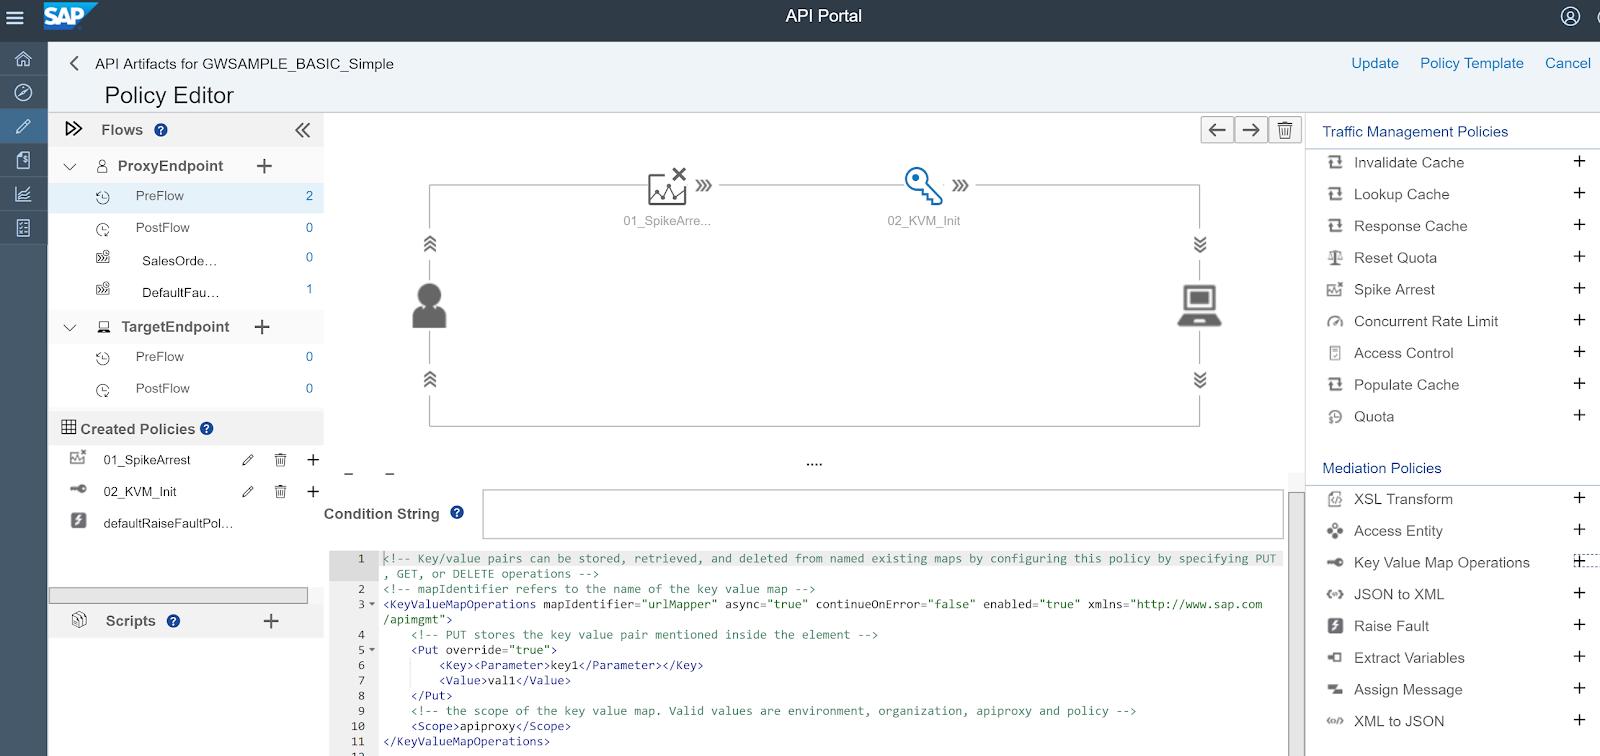 Integr8 Consulting | Apigee API Mgt ~ SAP API Mgt